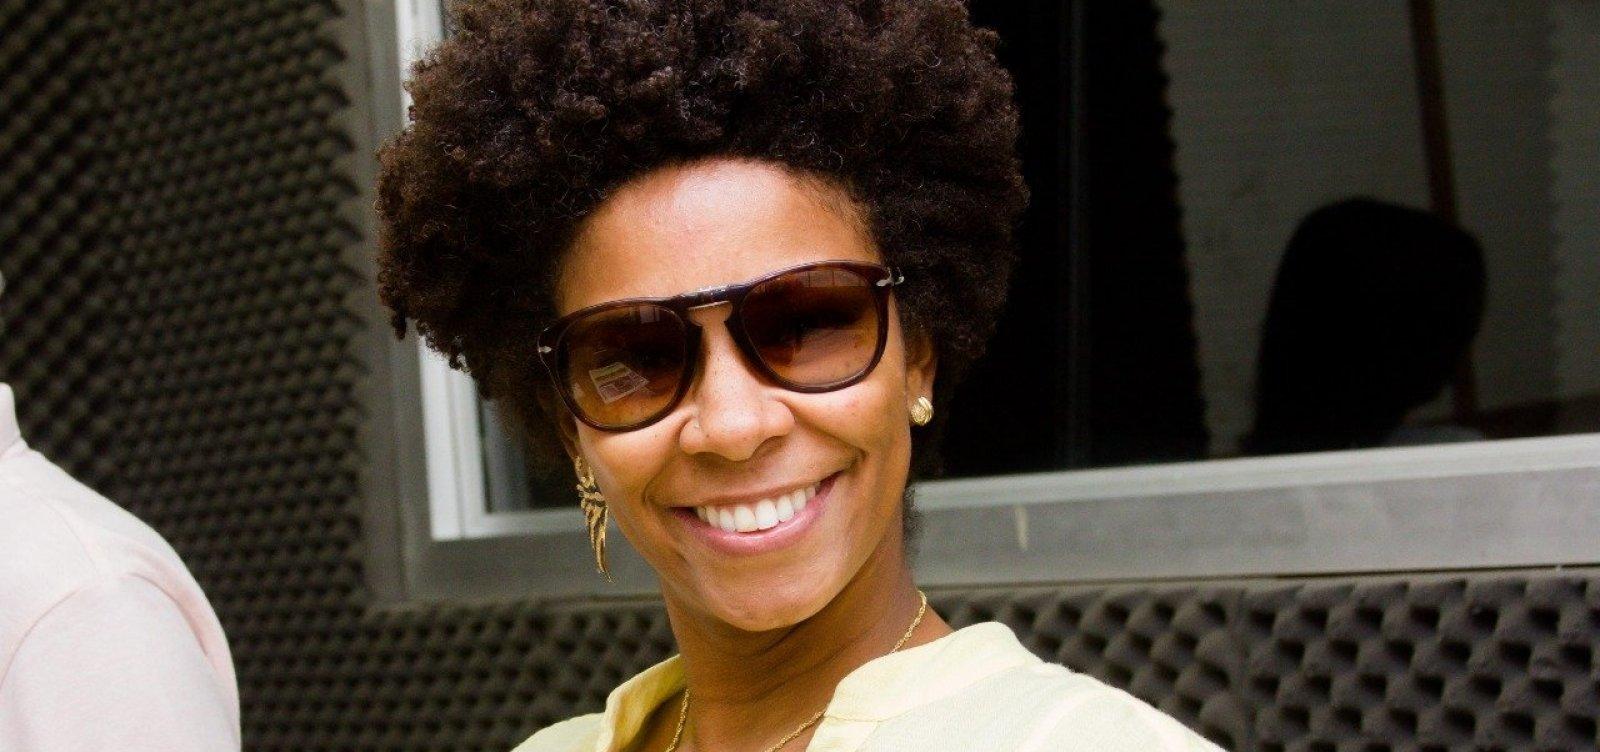 Após ataques racistas, jornalista Rita Batista aciona Justiça